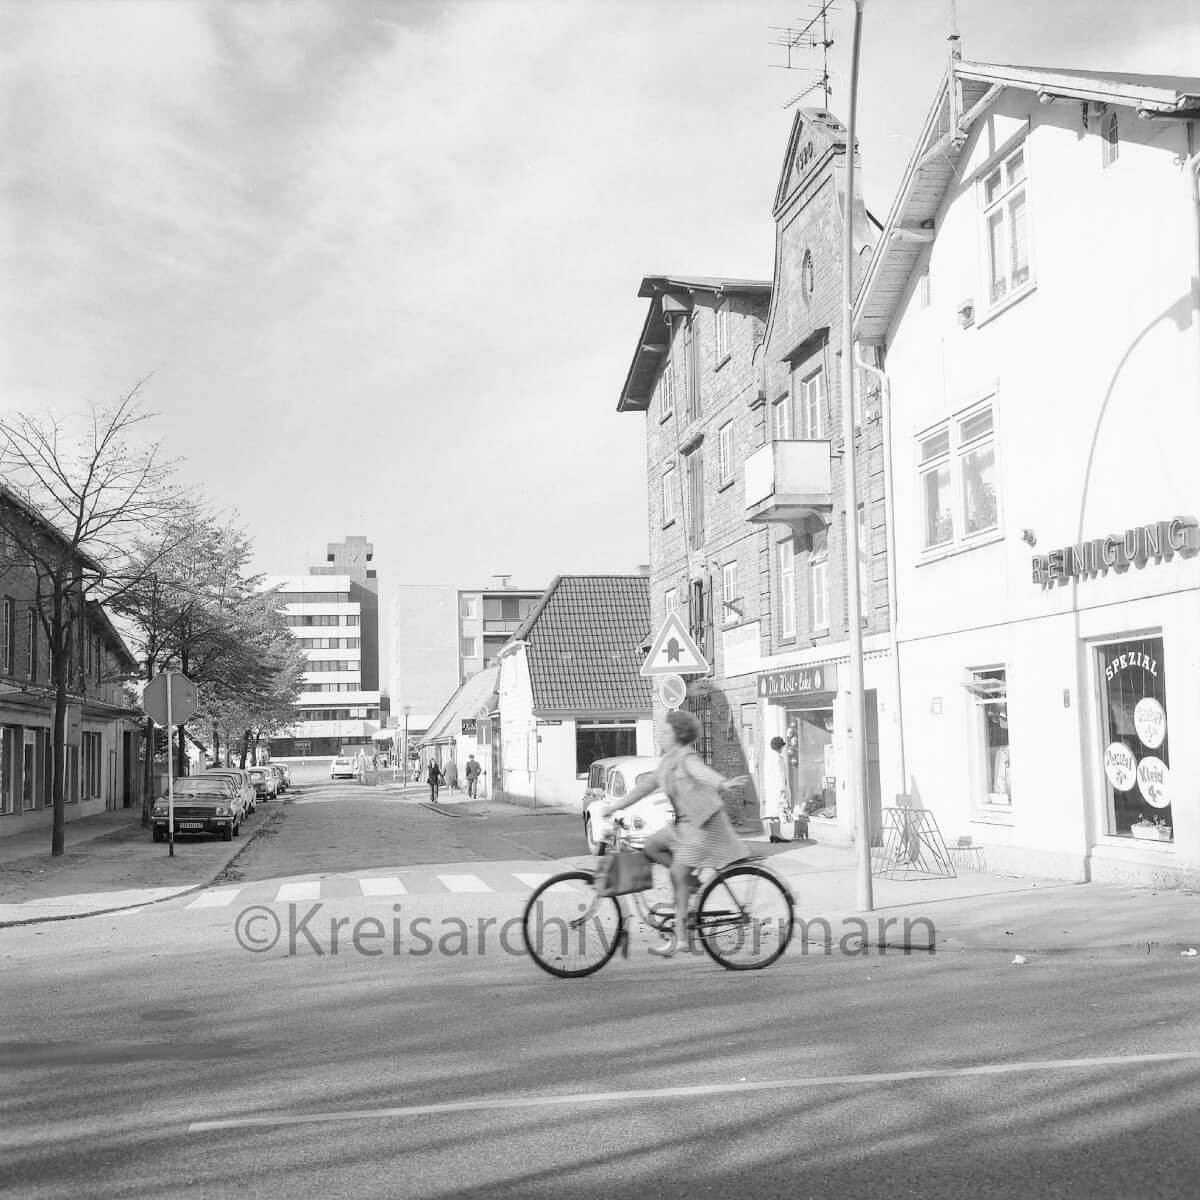 Foto: Kreisarchiv Stormarn / Raimund Marfels